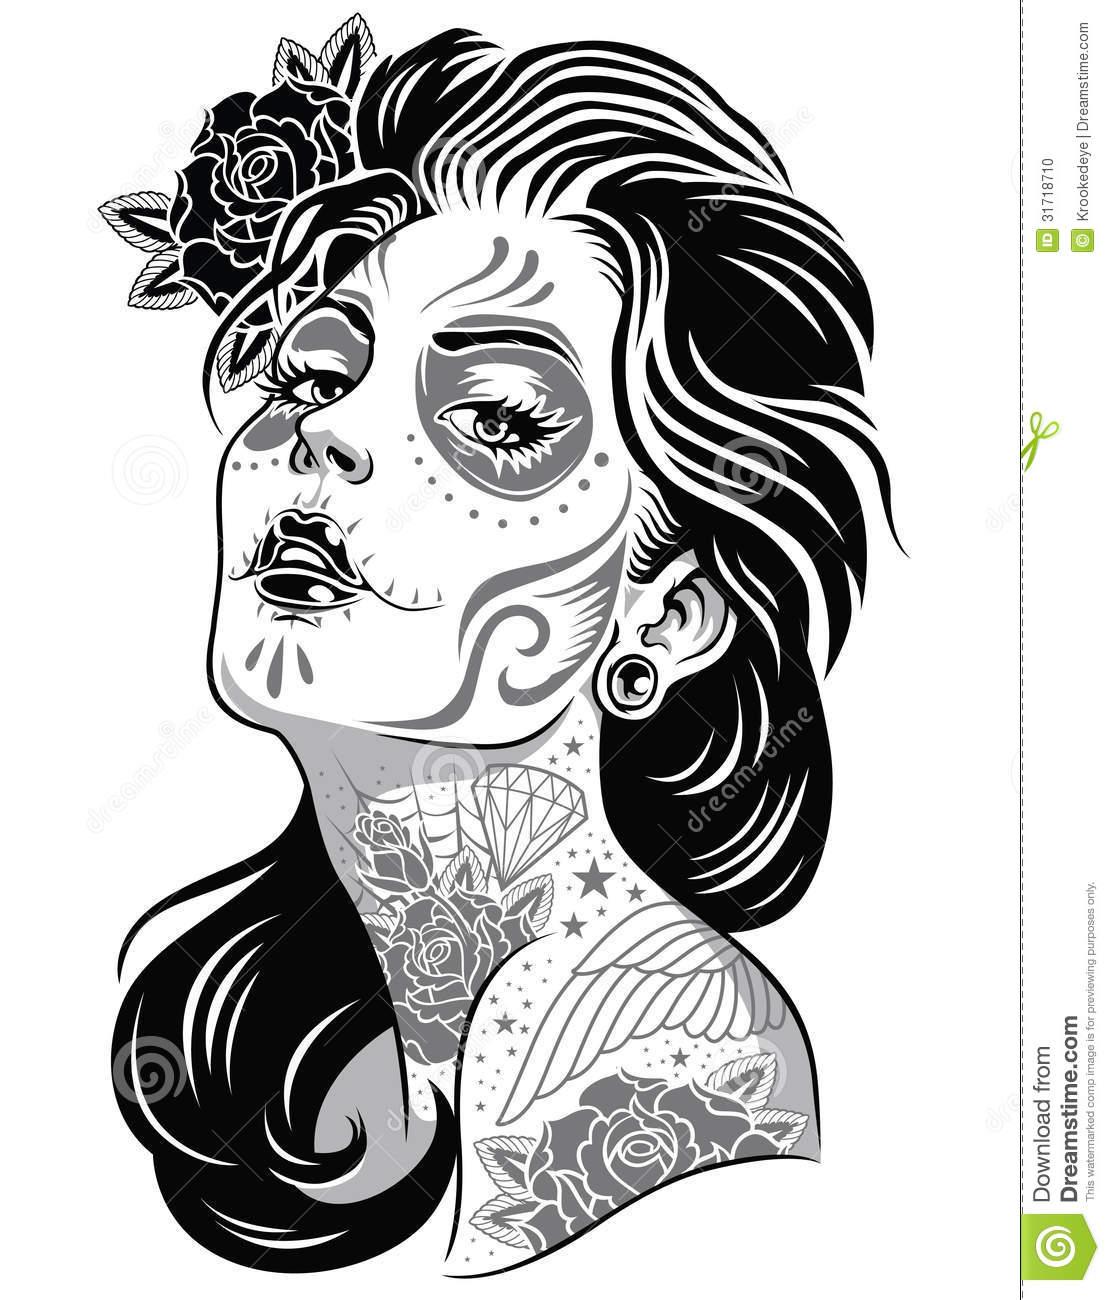 Dia de los muertos girly skull clipart banner library download Dia de los muertos clipart female - 90 transparent clip arts, images ... banner library download